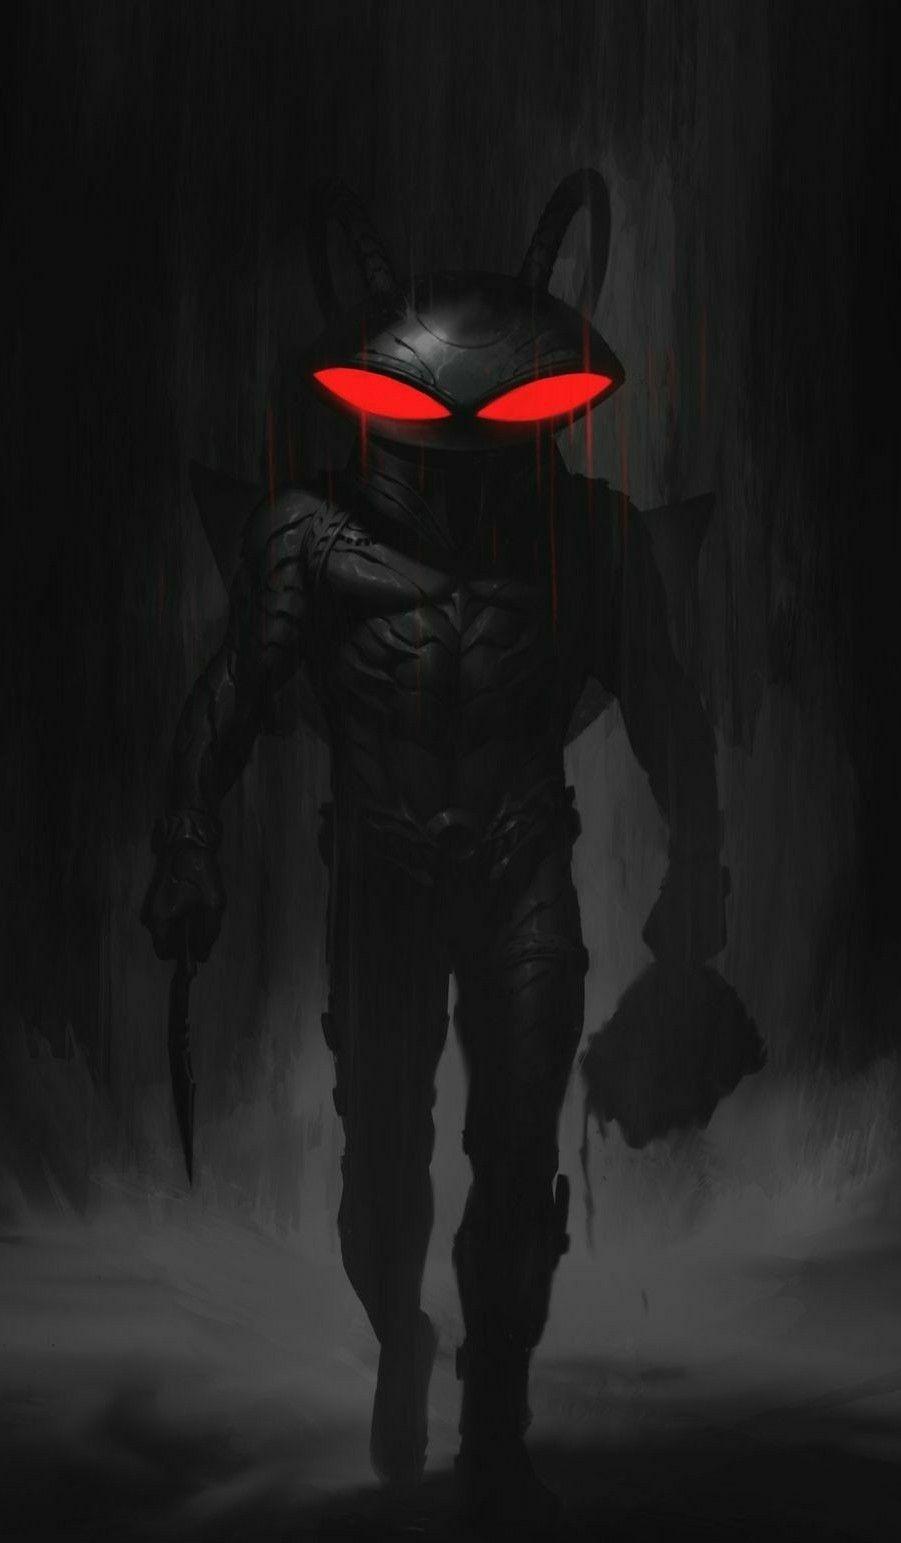 Aranha Negra Dc Comics Art Black Manta Superhero Villains